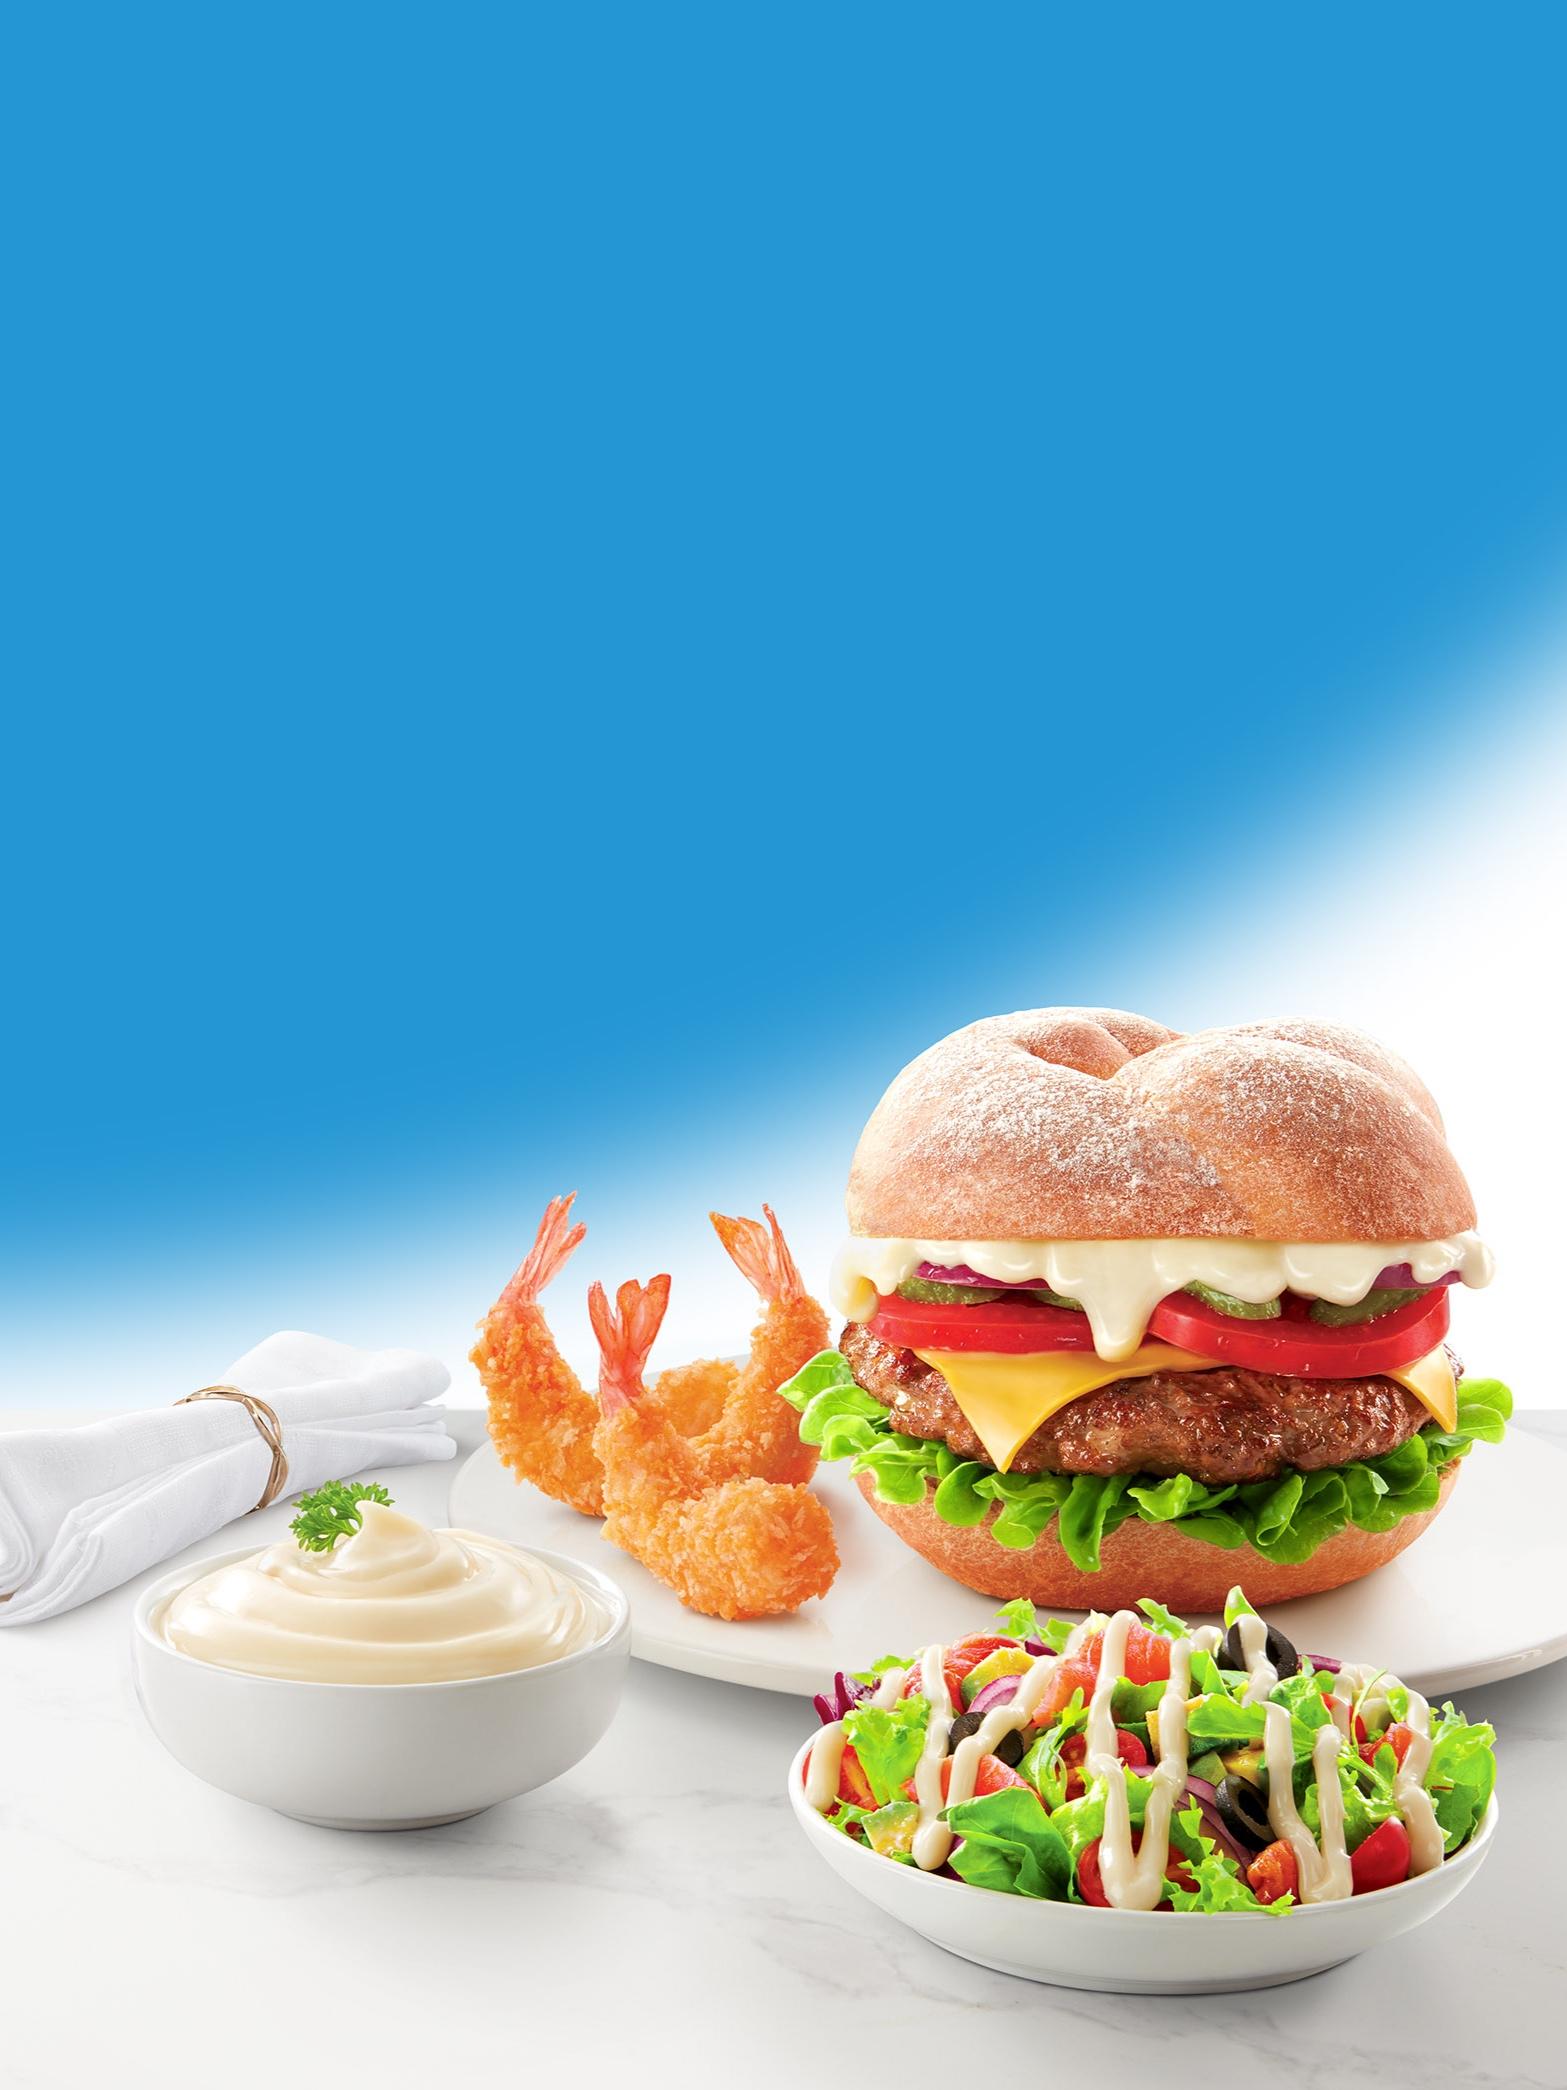 Food-MAYUMI rev 72.jpg